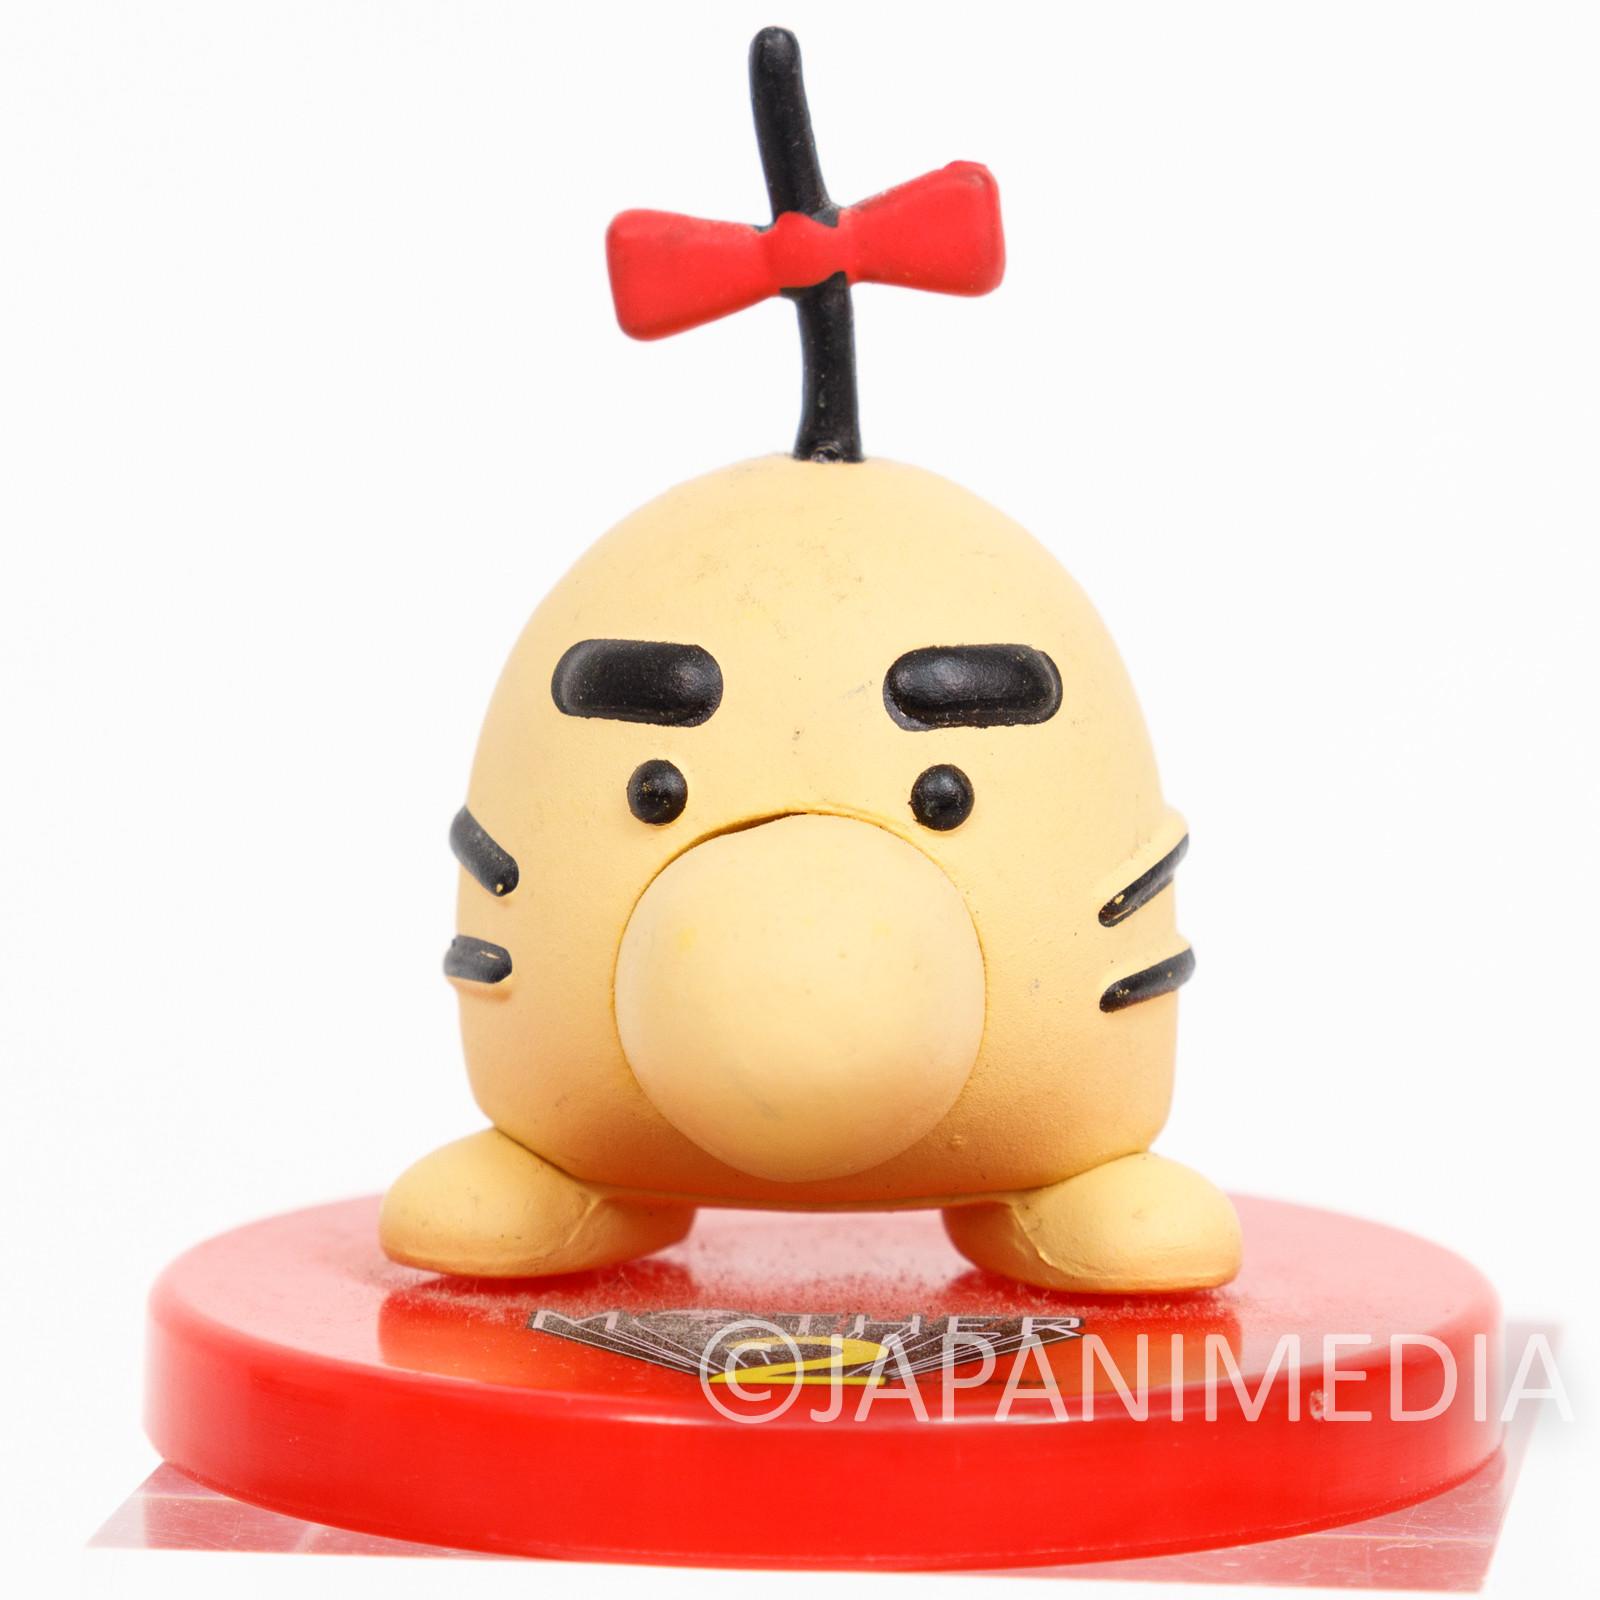 Mother 2 Dosei-san Stand Figure Takara Tomy Nintendo JAPAN GAME NES FAMICOM